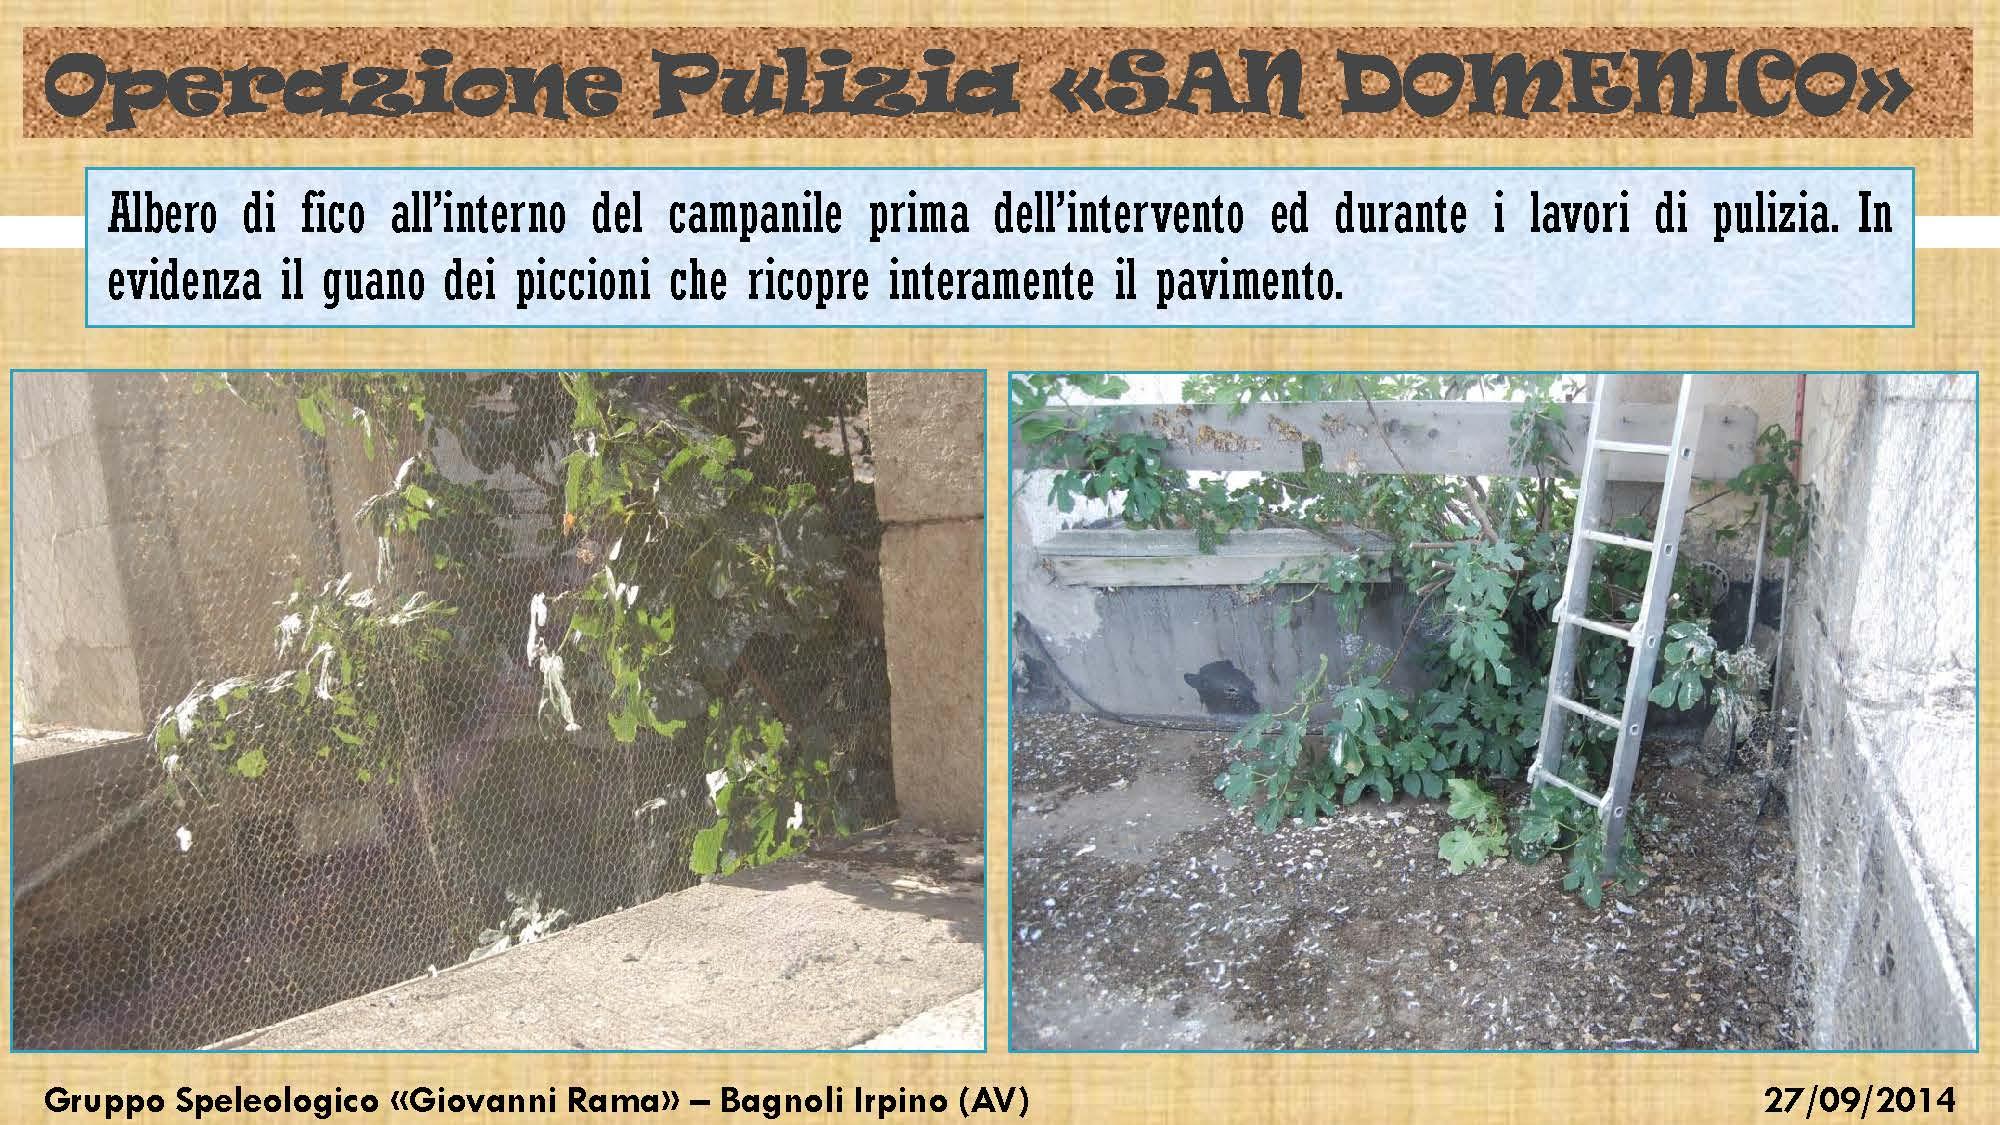 Bagnoli-Pulizia-San-Domenico-2014_Pagina_14